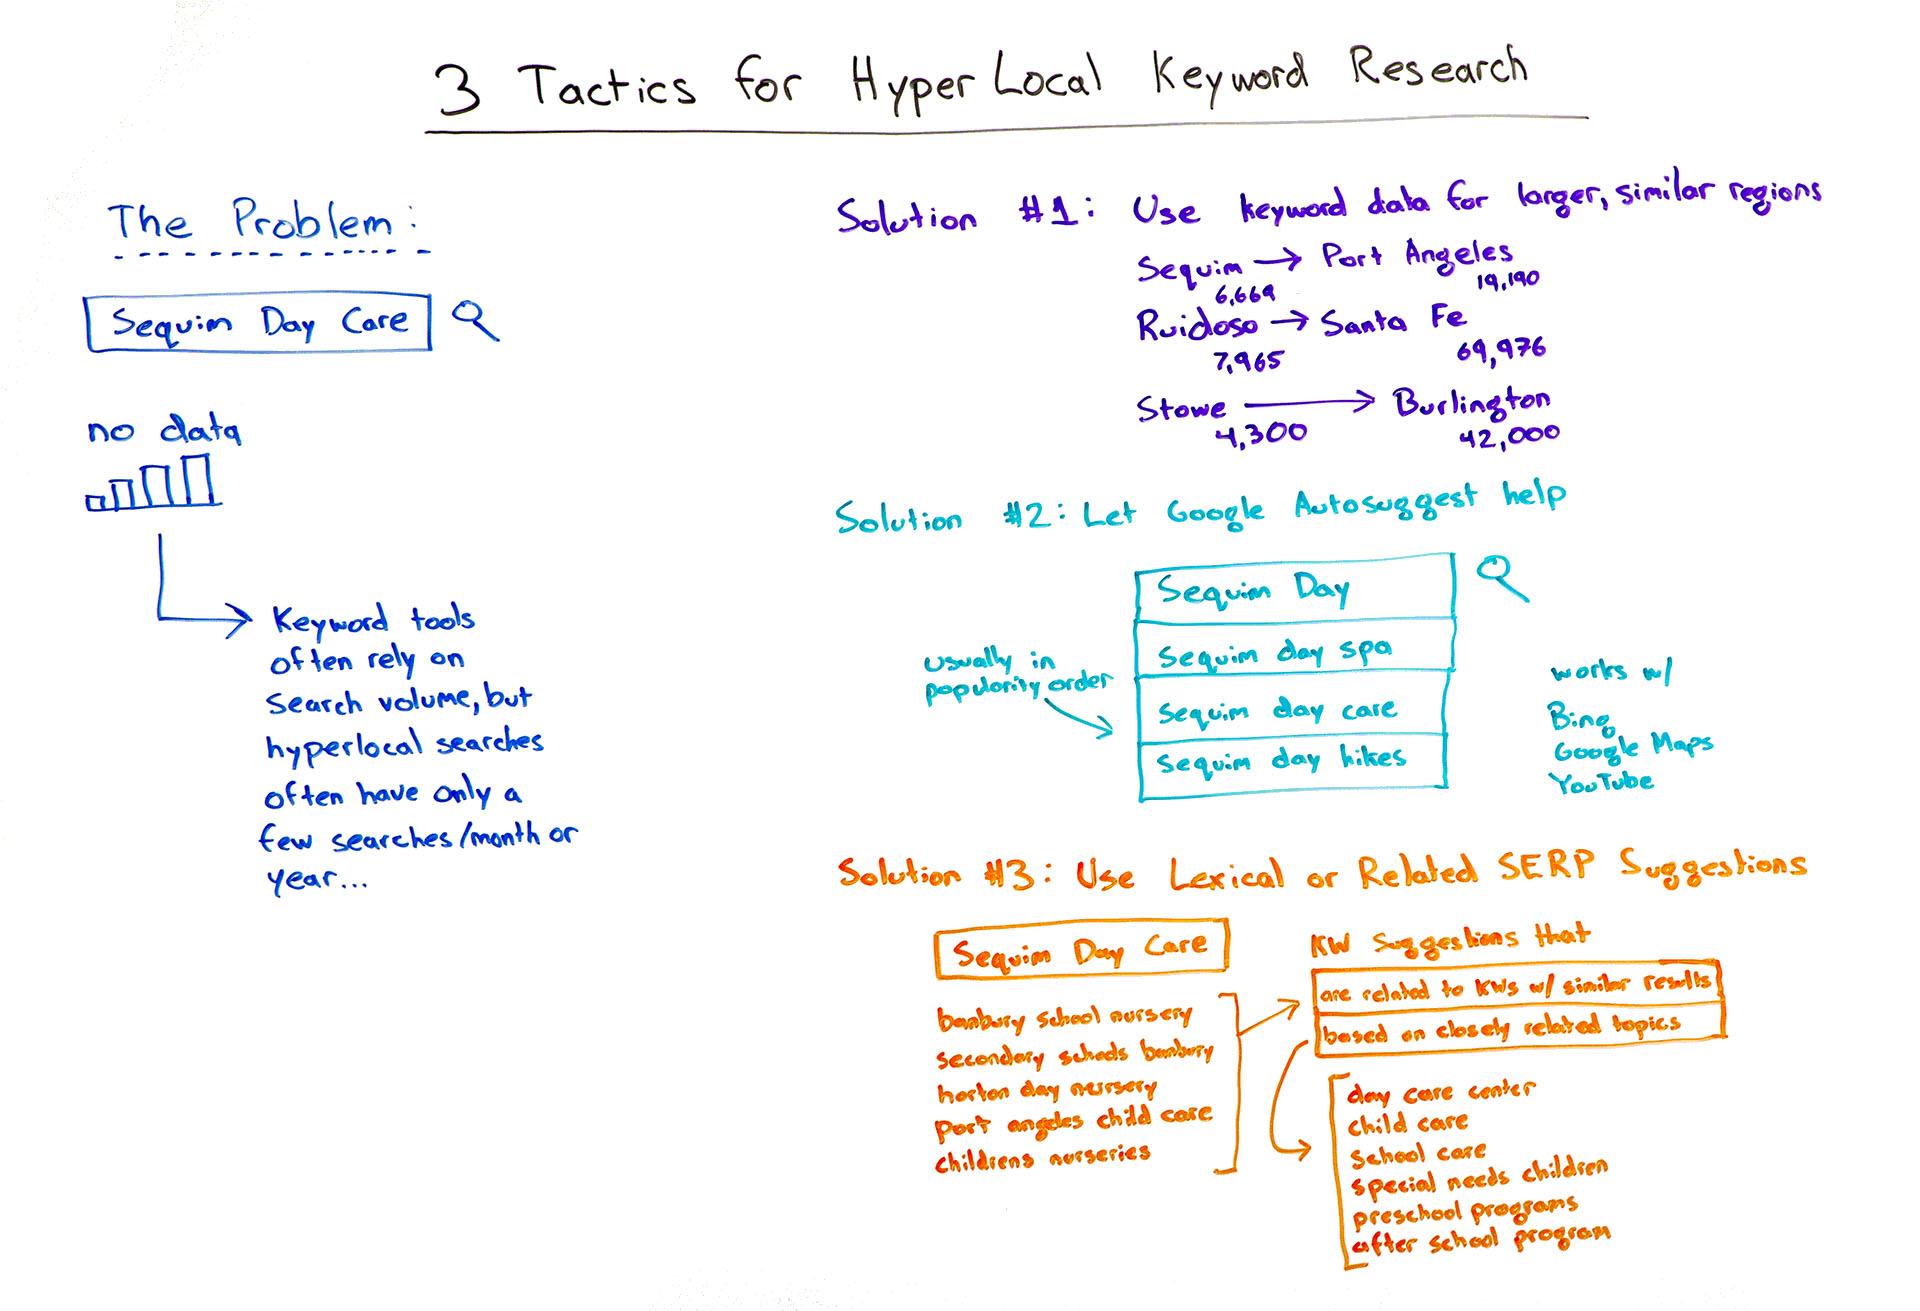 Hyper Local Keyword Research